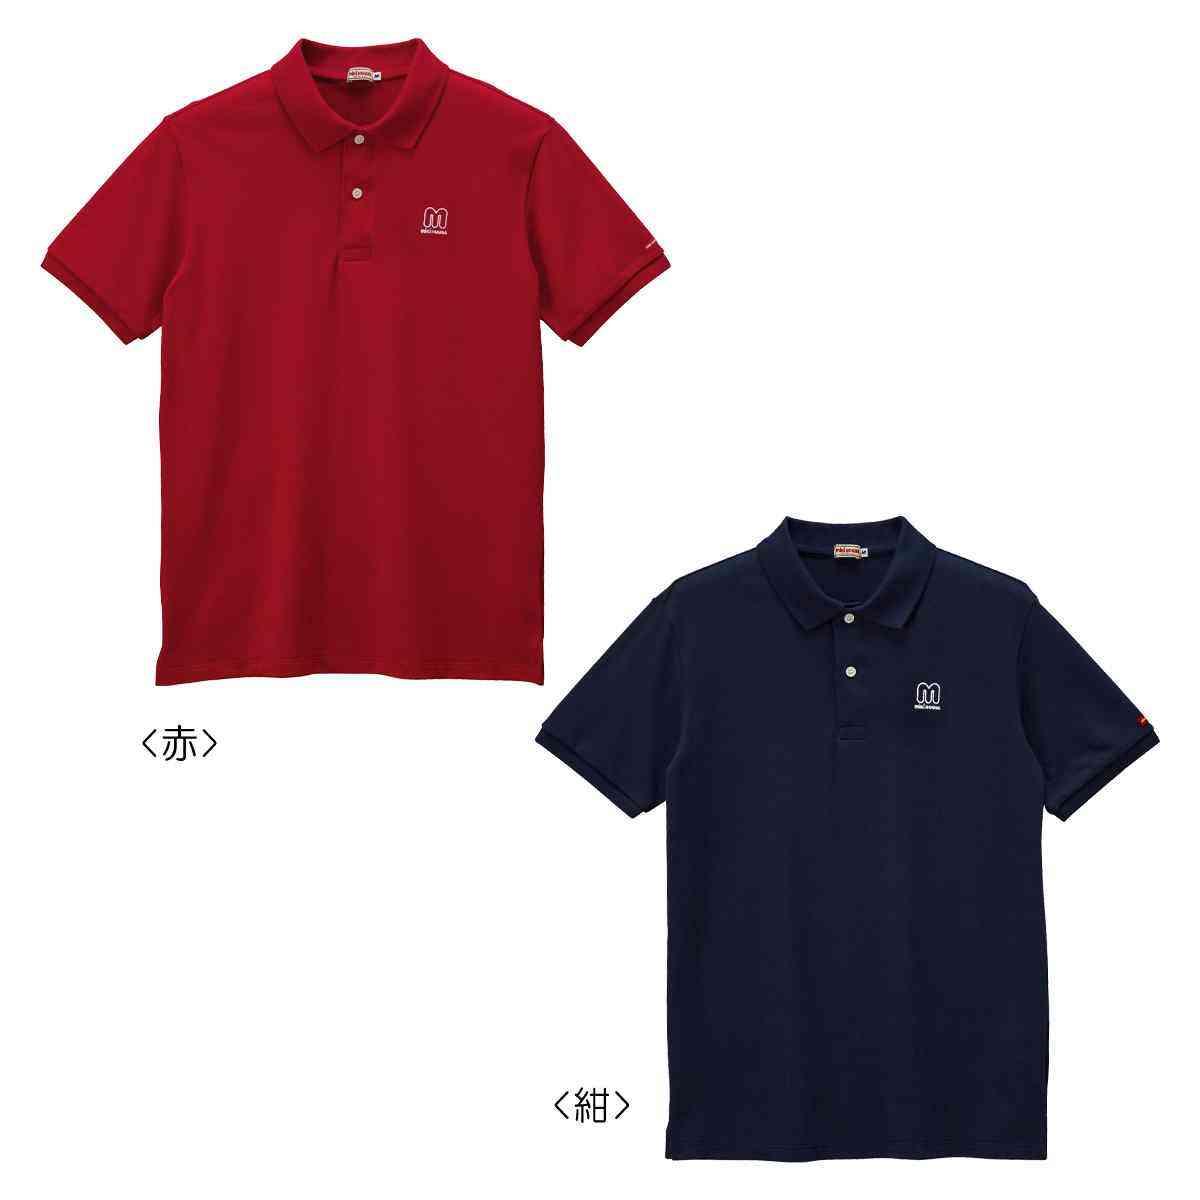 ☆ mikiHOUSE(ミキハウス)mロゴ 半袖ポロシャツ 大人用 S-L 12-5571-616